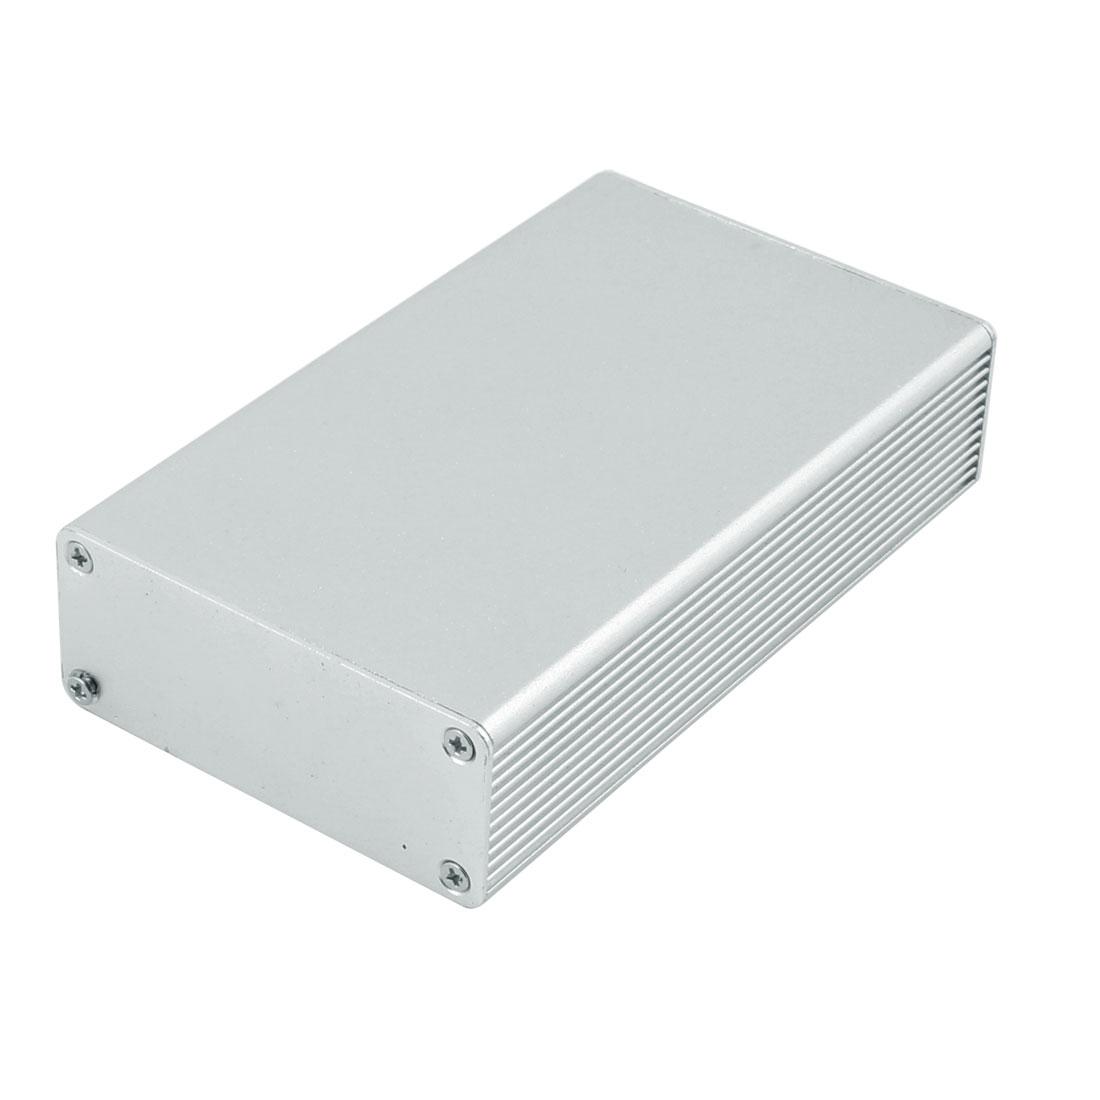 112 x 66 x 27mm Multi-purpose Electronic Extruded Aluminum Enclosure Silver Tone